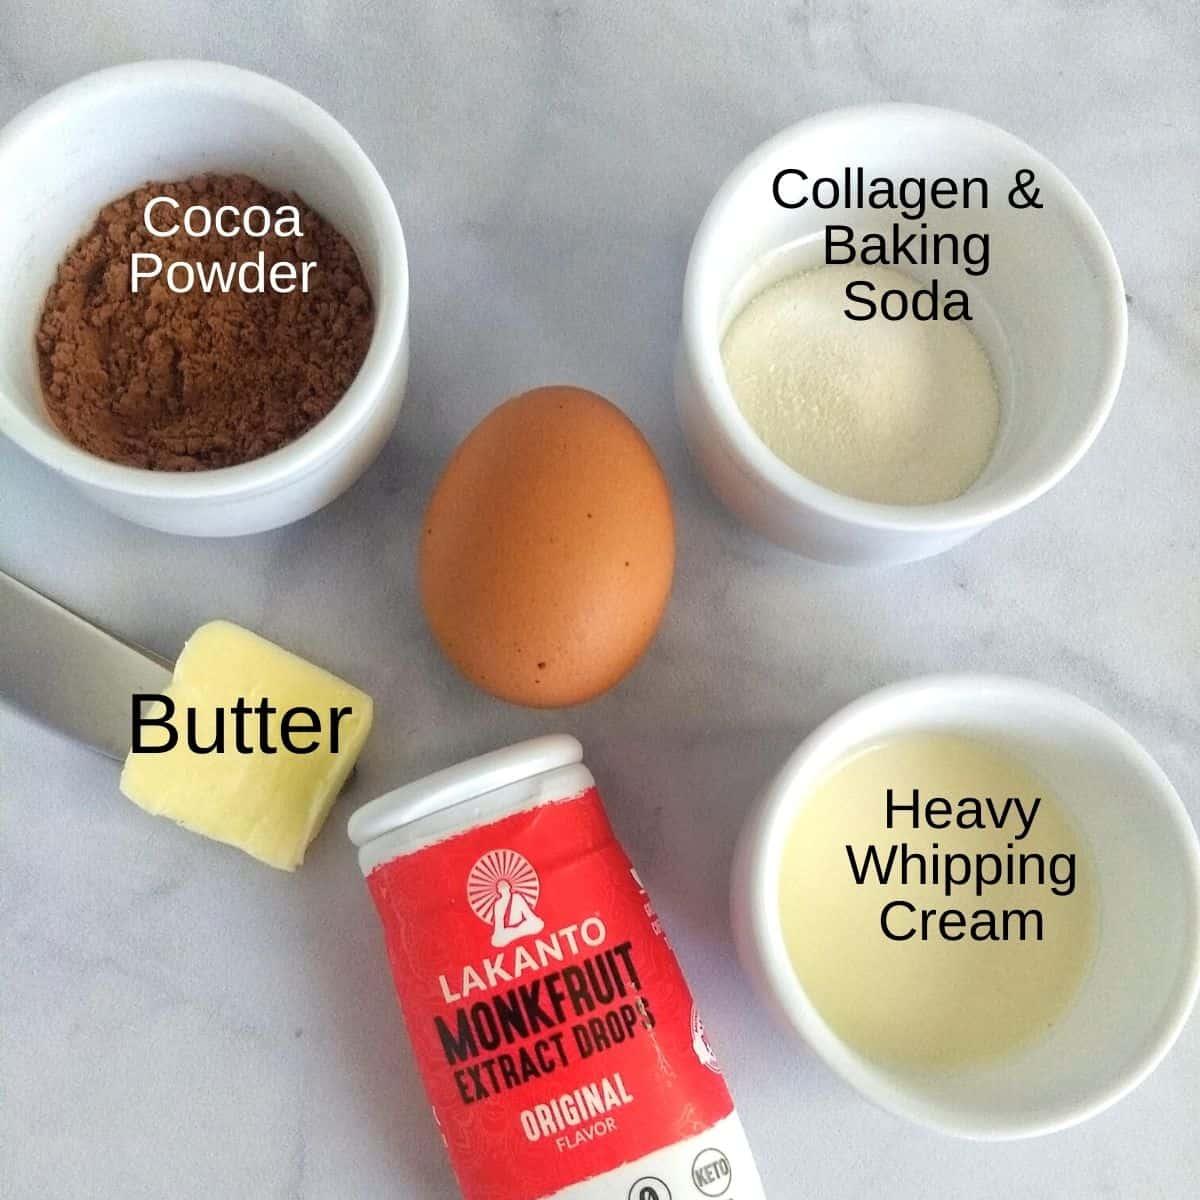 Keto Chocolate Mug Cake ingredients - Keto Chocolate Mug Cake